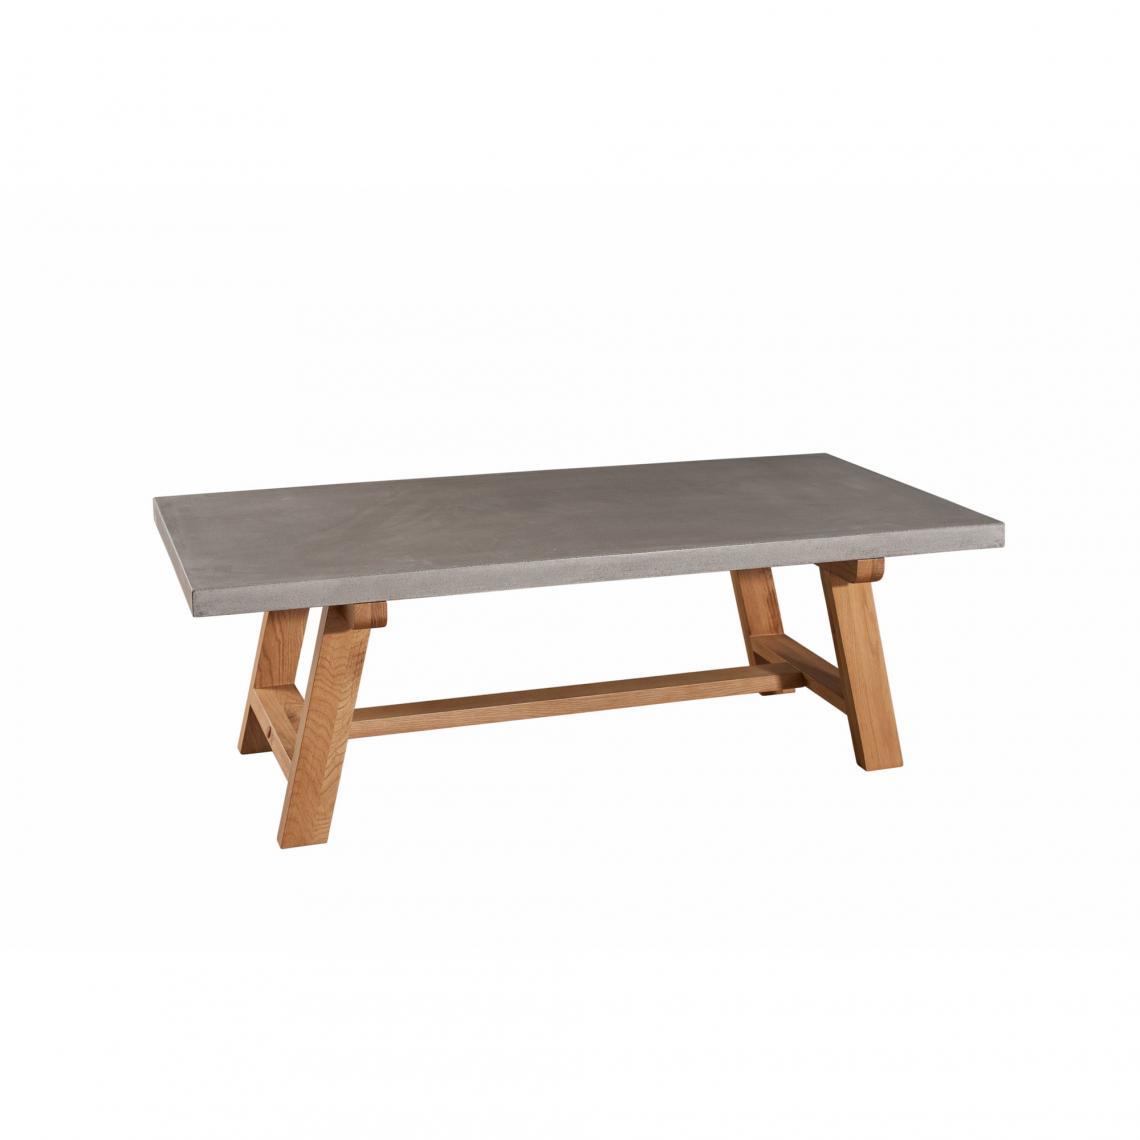 3 suisses table basse relevable